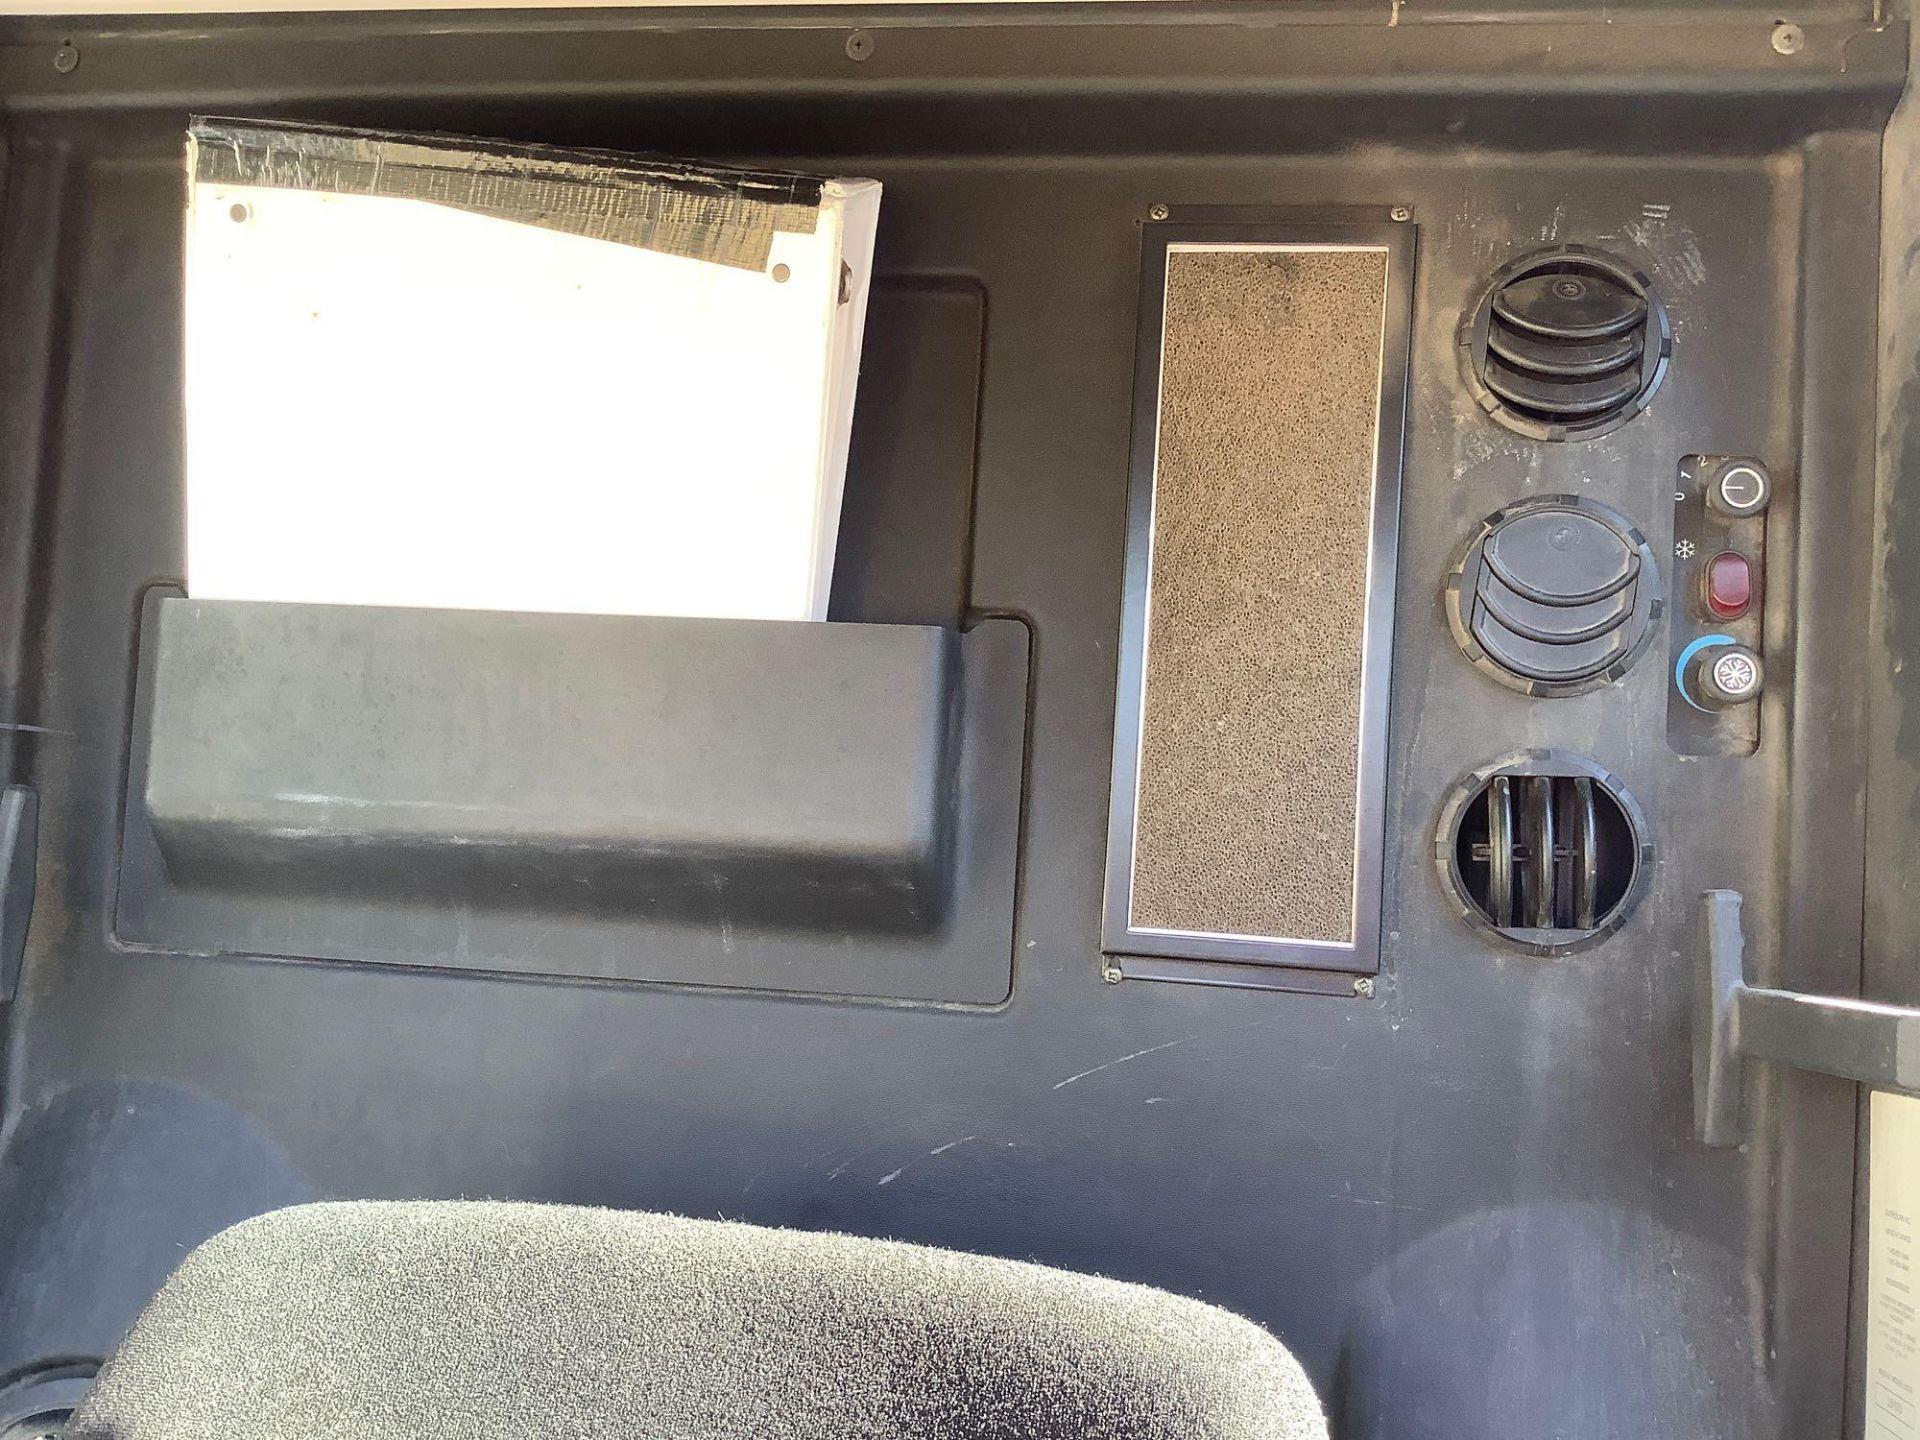 MADVAC COMPACT SWEEPER MODEL LS100 ,ENCLOSED CAB,BACK UP CAMERA, A/C AIR, EXTRA KEY - Image 9 of 15